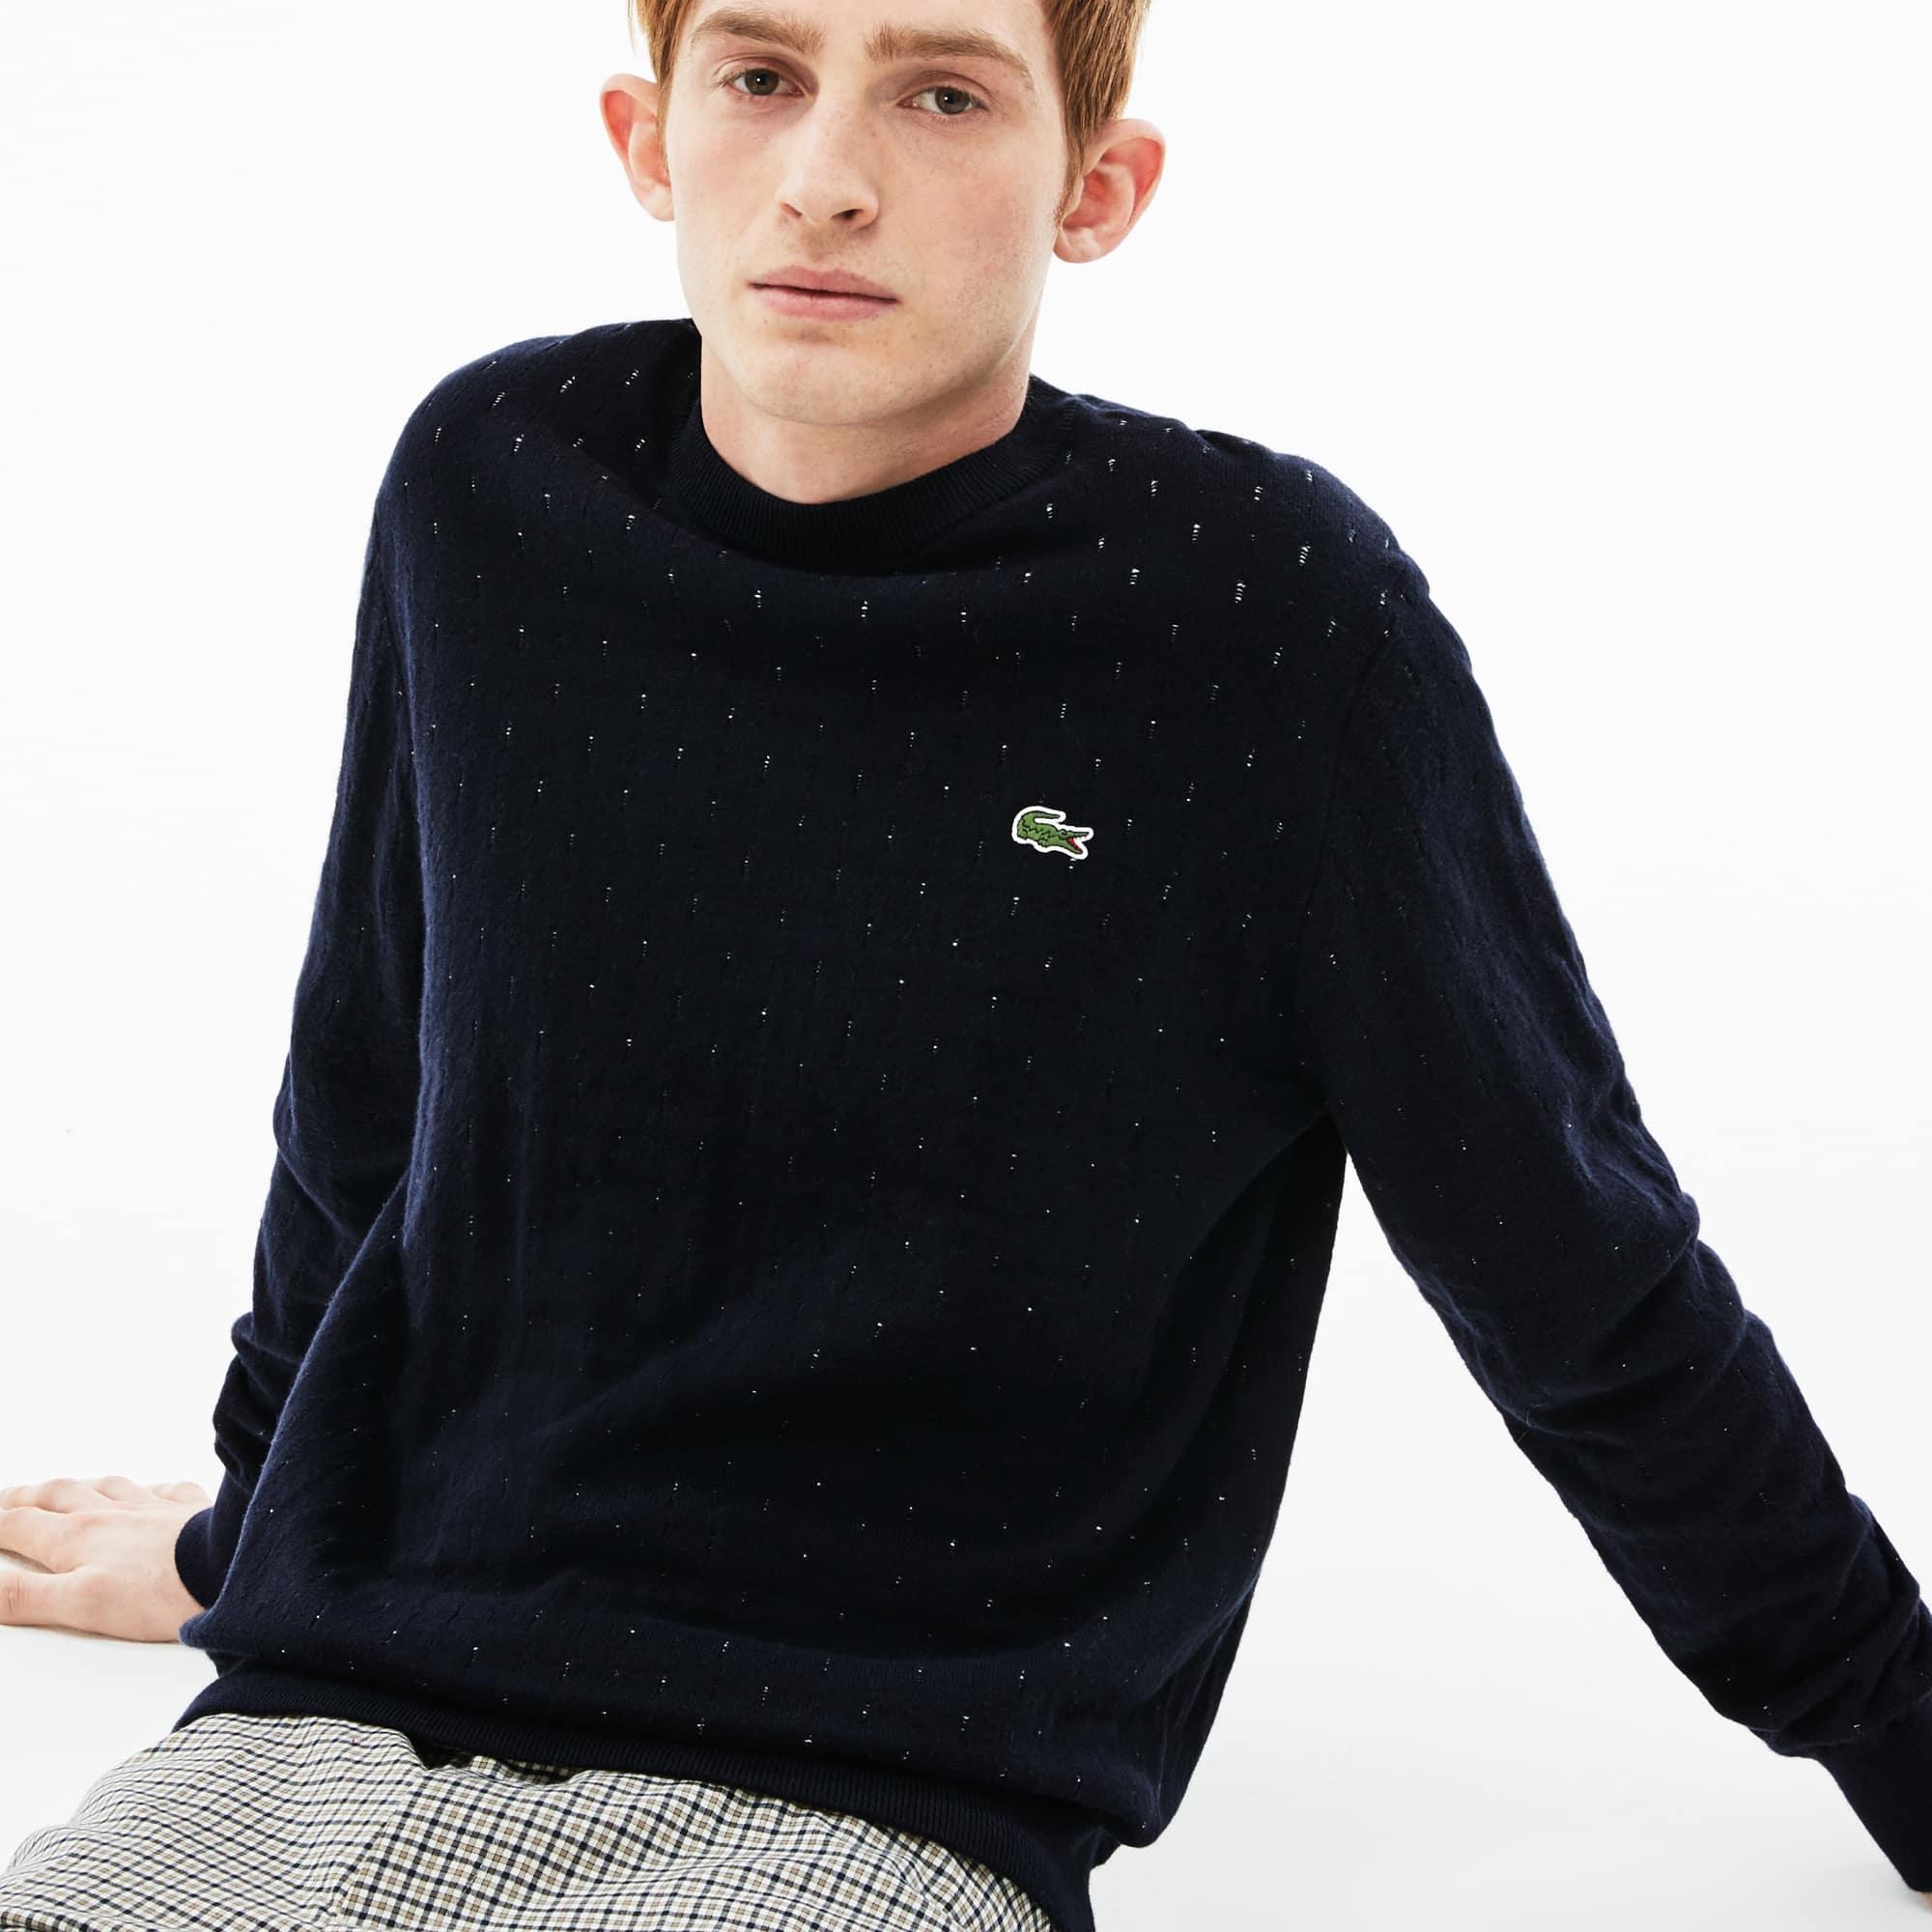 Men's Lacoste LIVE Crew Neck Cotton And Cashmere Jacquard Sweater